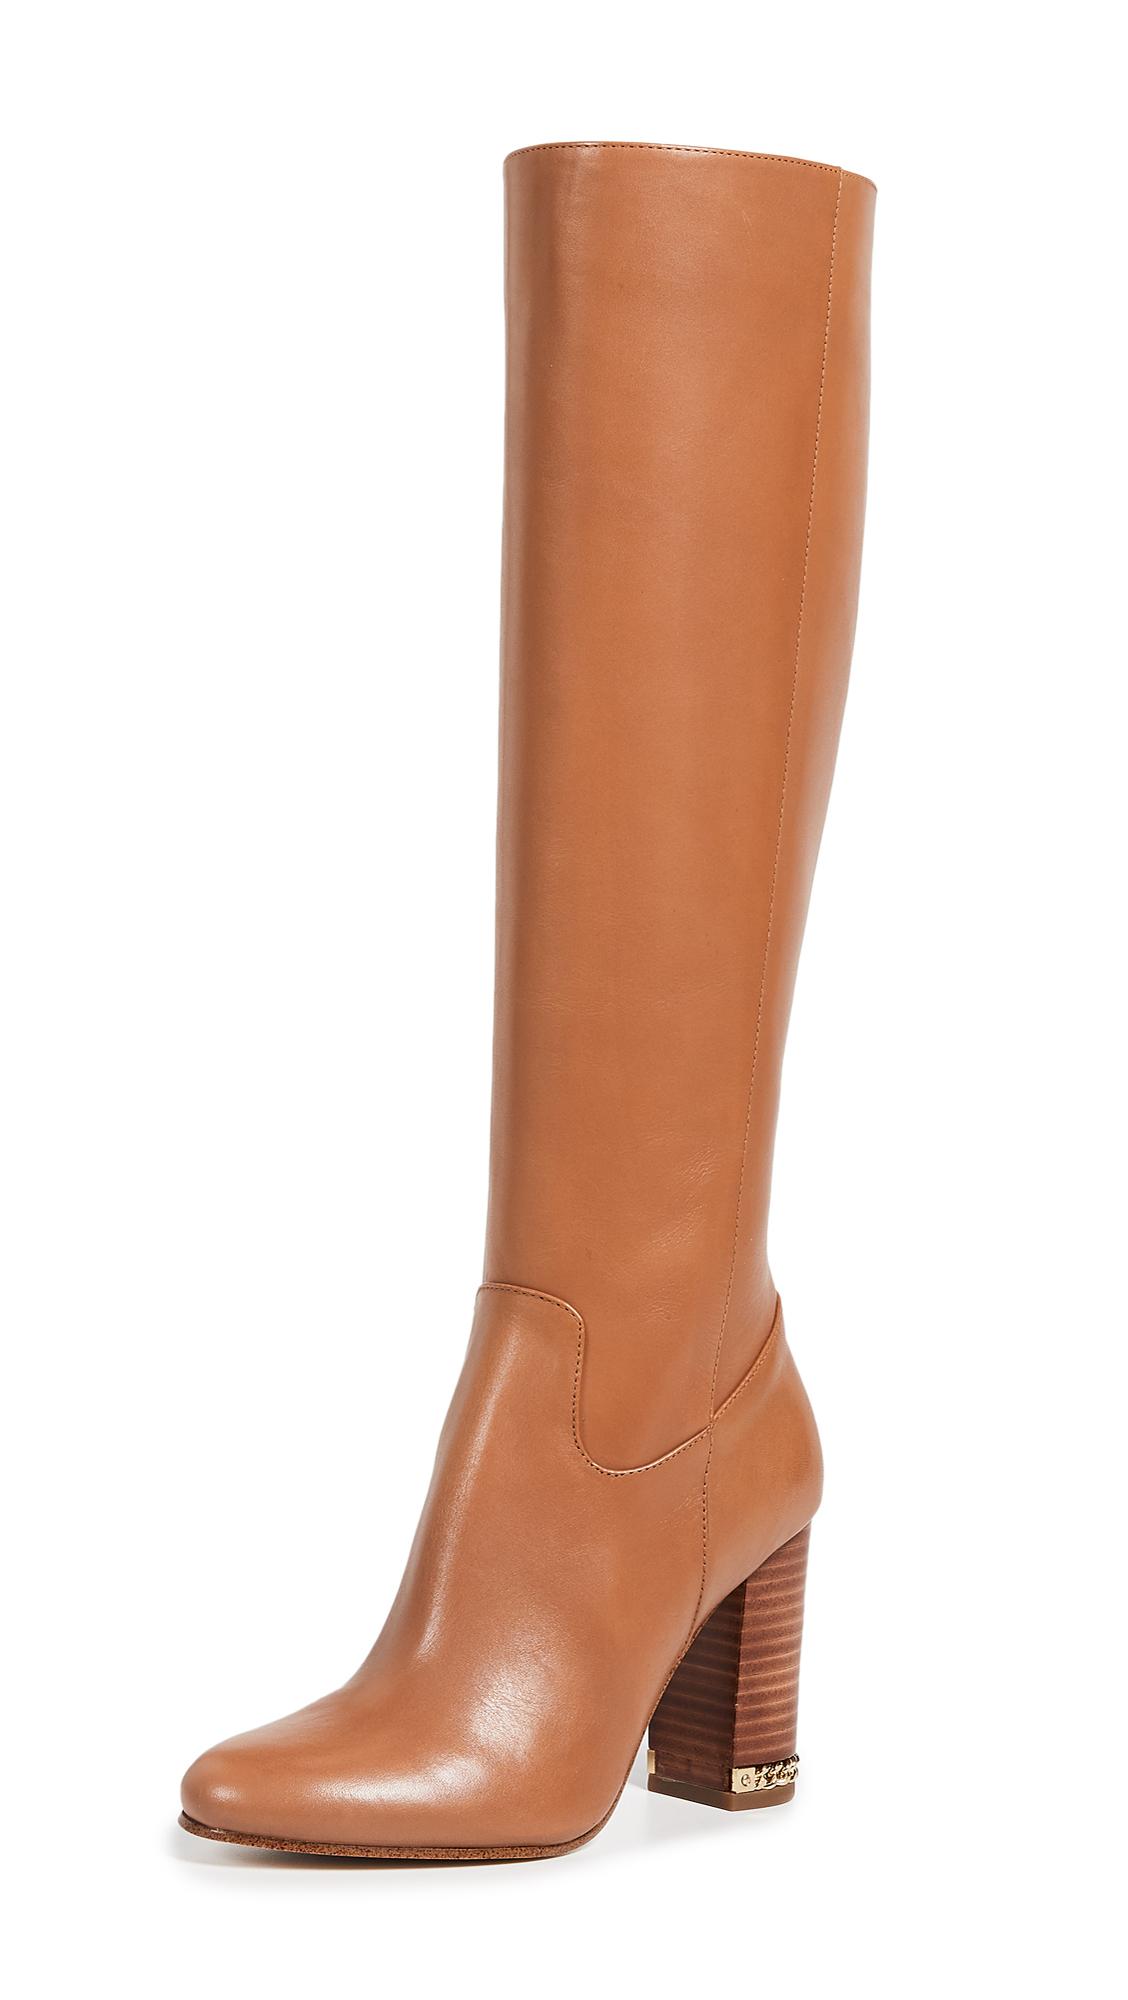 MICHAEL Michael Kors Walker Tall Boots - Acorn